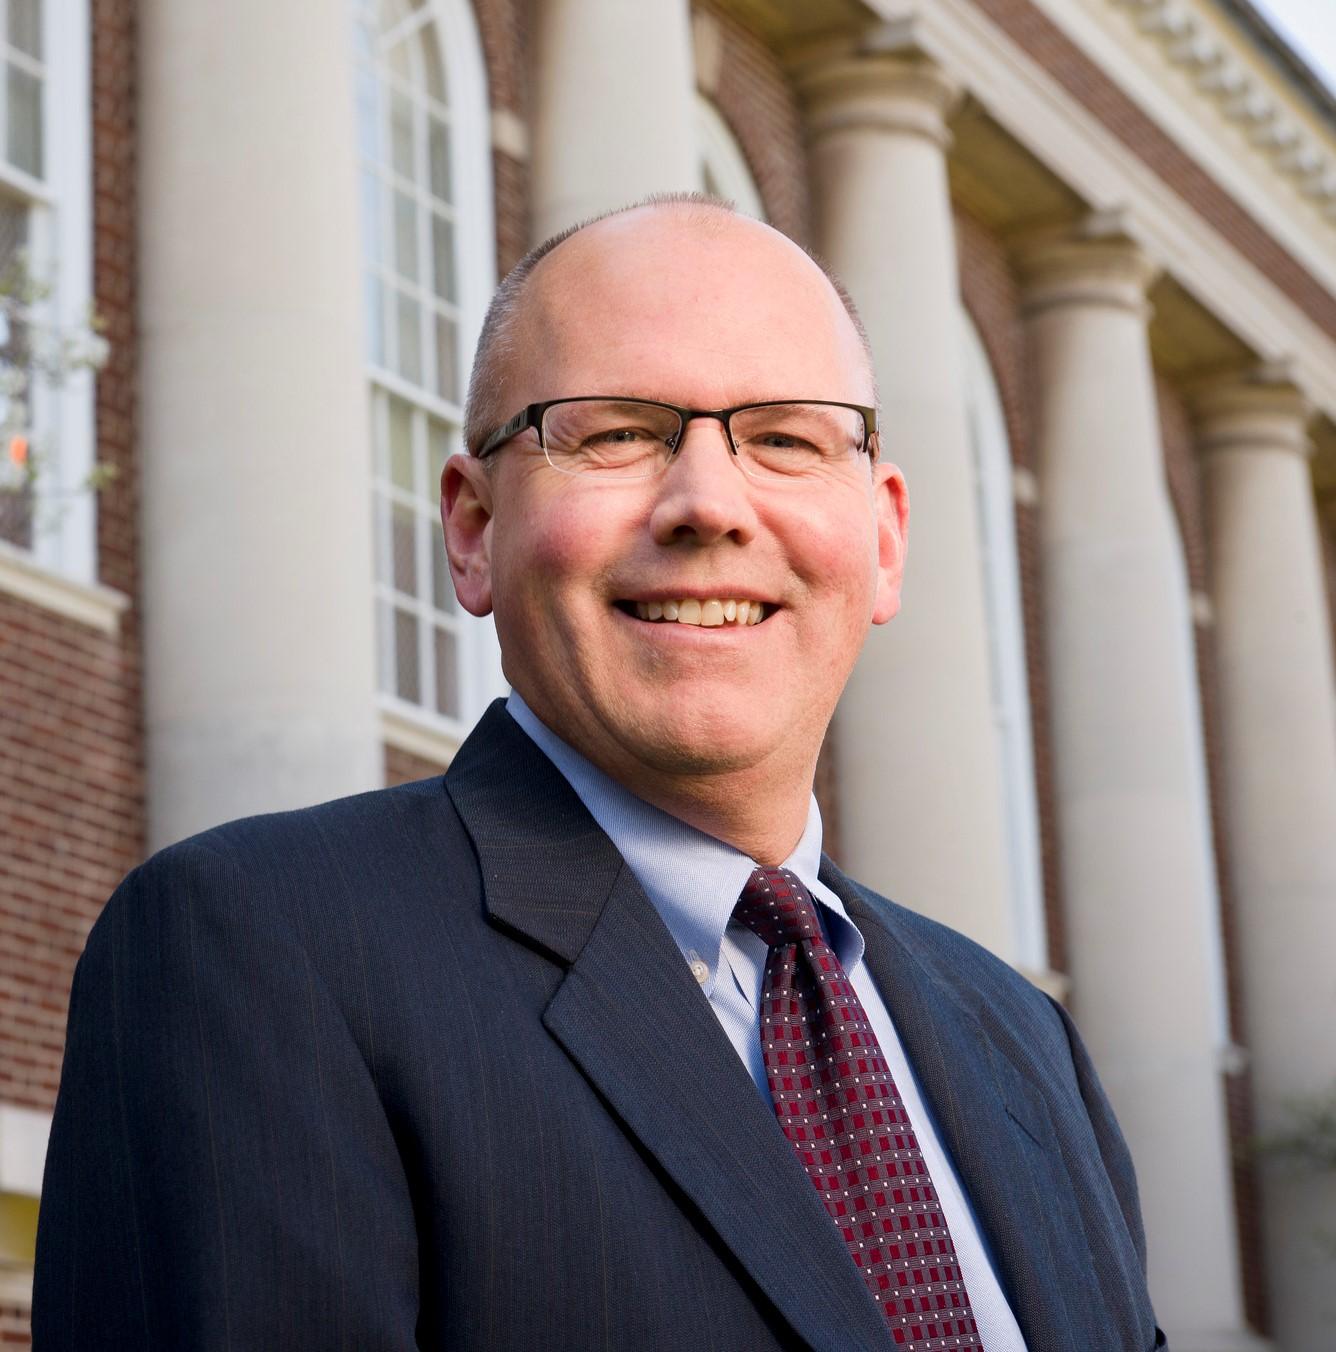 Provost Chris Zappe (Photo courtesy of Gettysburg College)